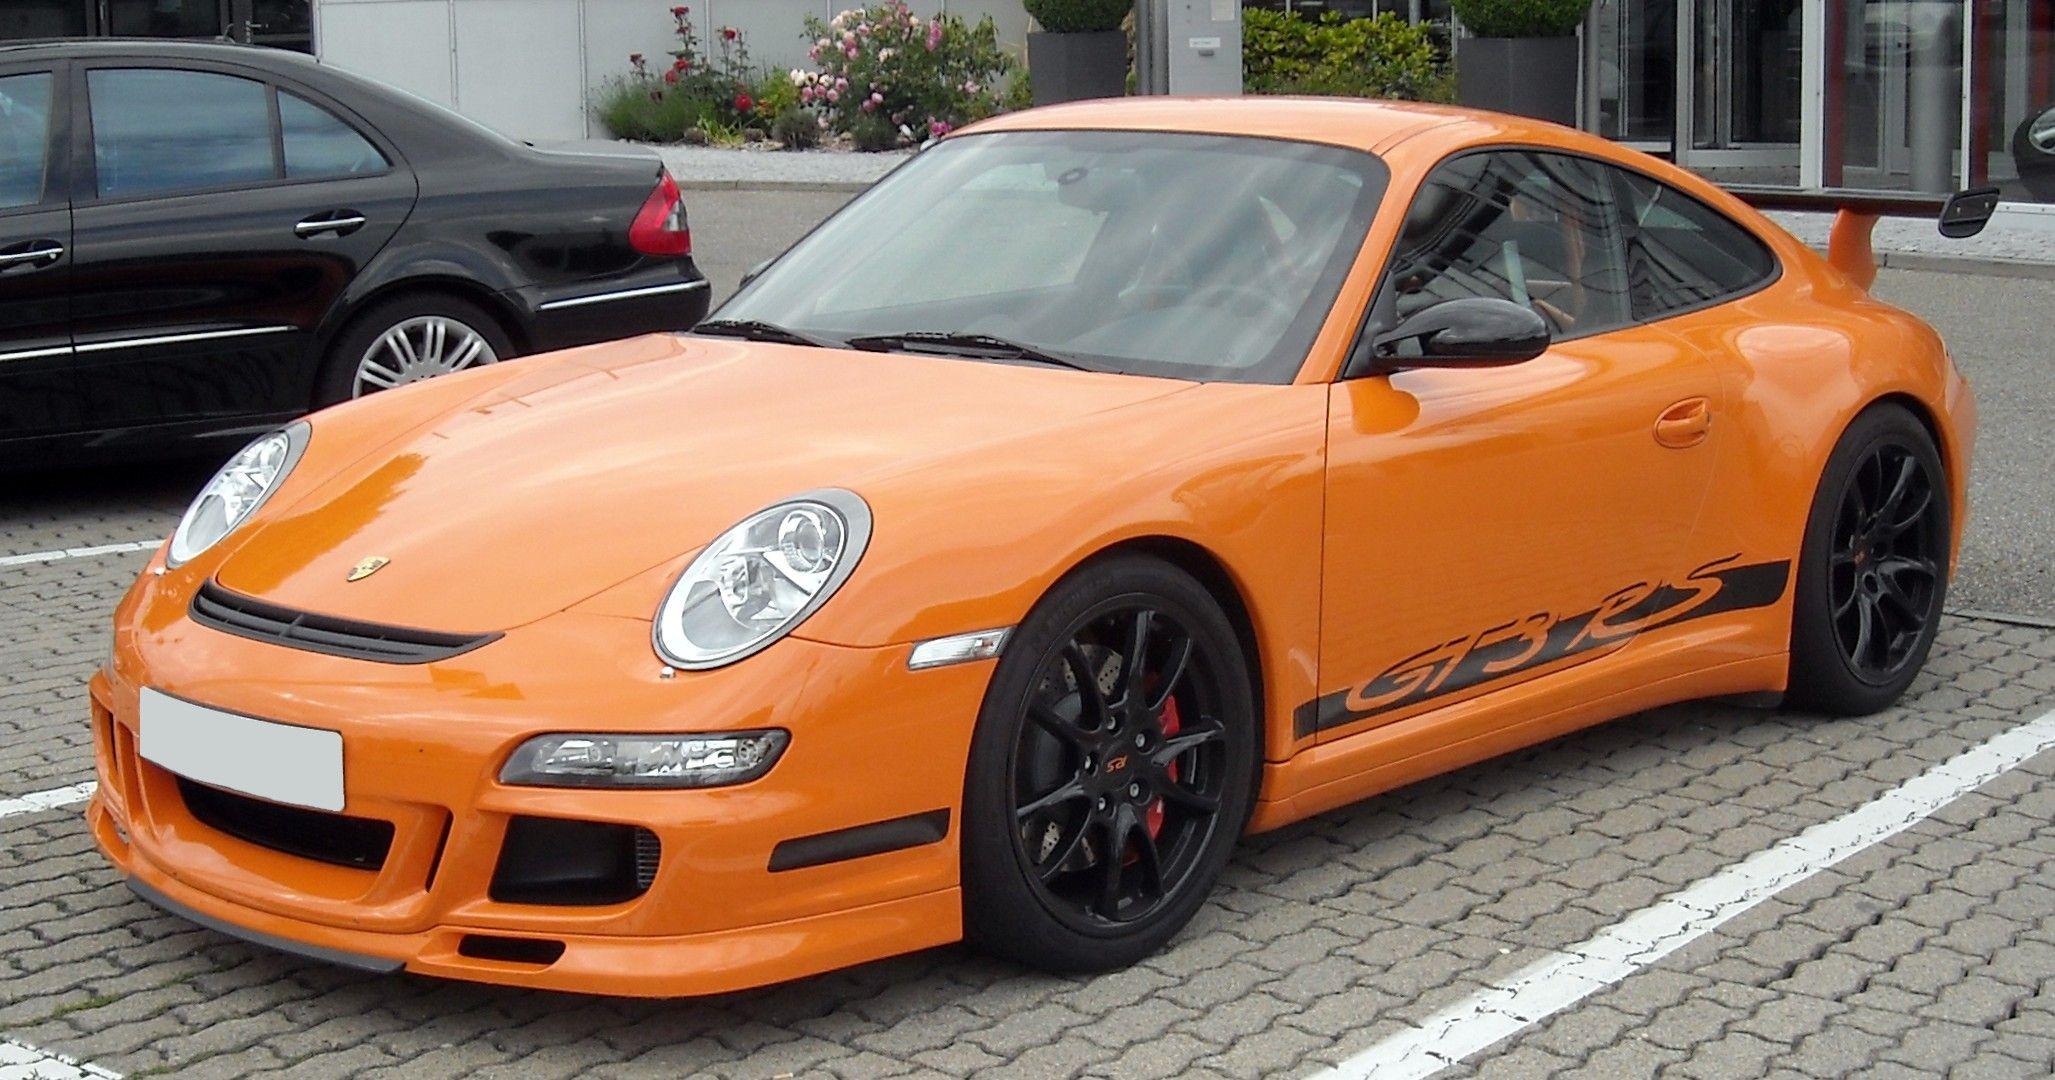 porsche 911 gt3 rs google search orange race cars pinterest best gt3 rs porsche 911. Black Bedroom Furniture Sets. Home Design Ideas